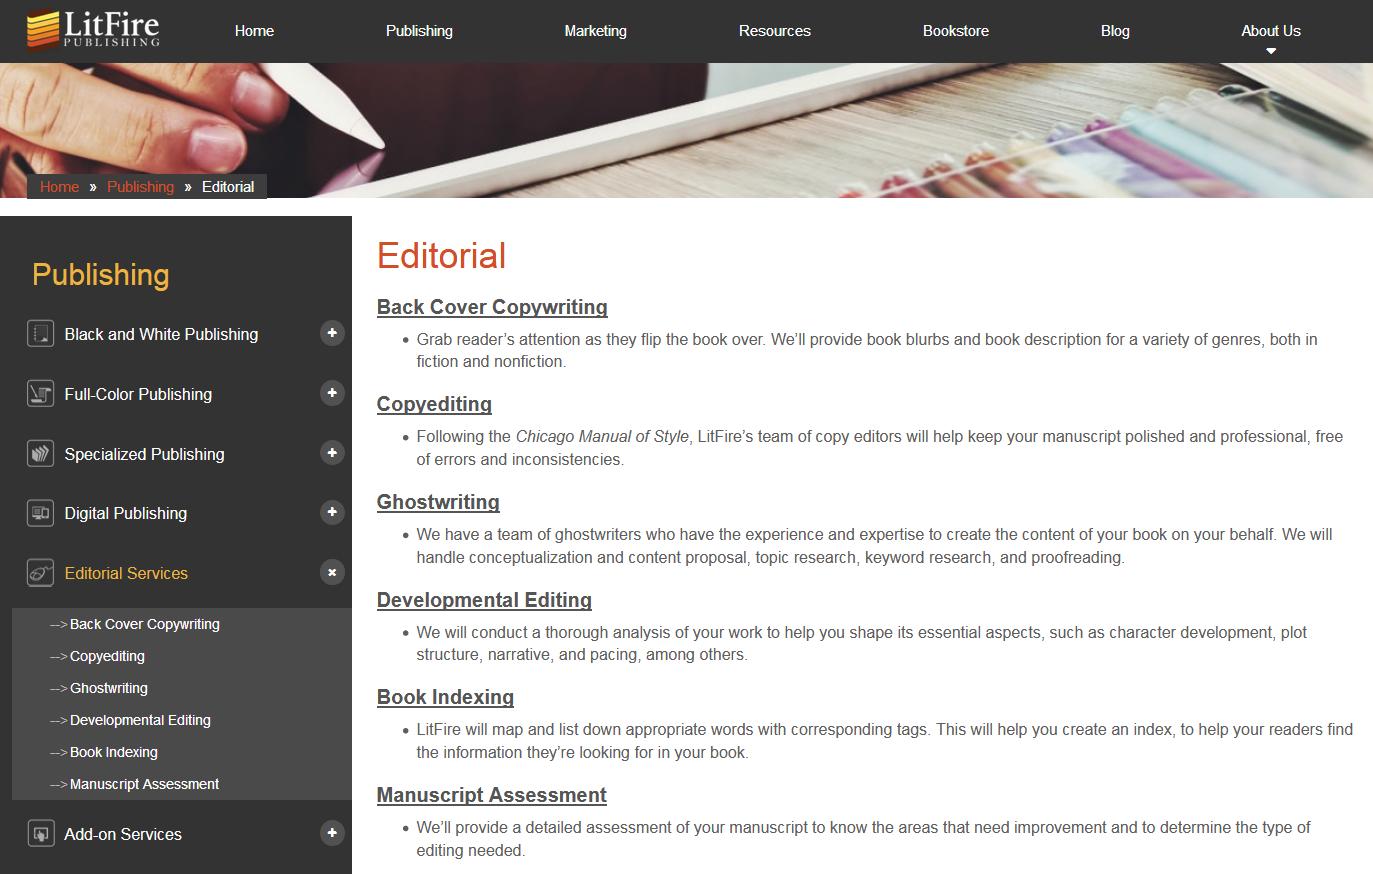 Writer Beware®: The Blog: Solicitation Alert: LitFire Publishing